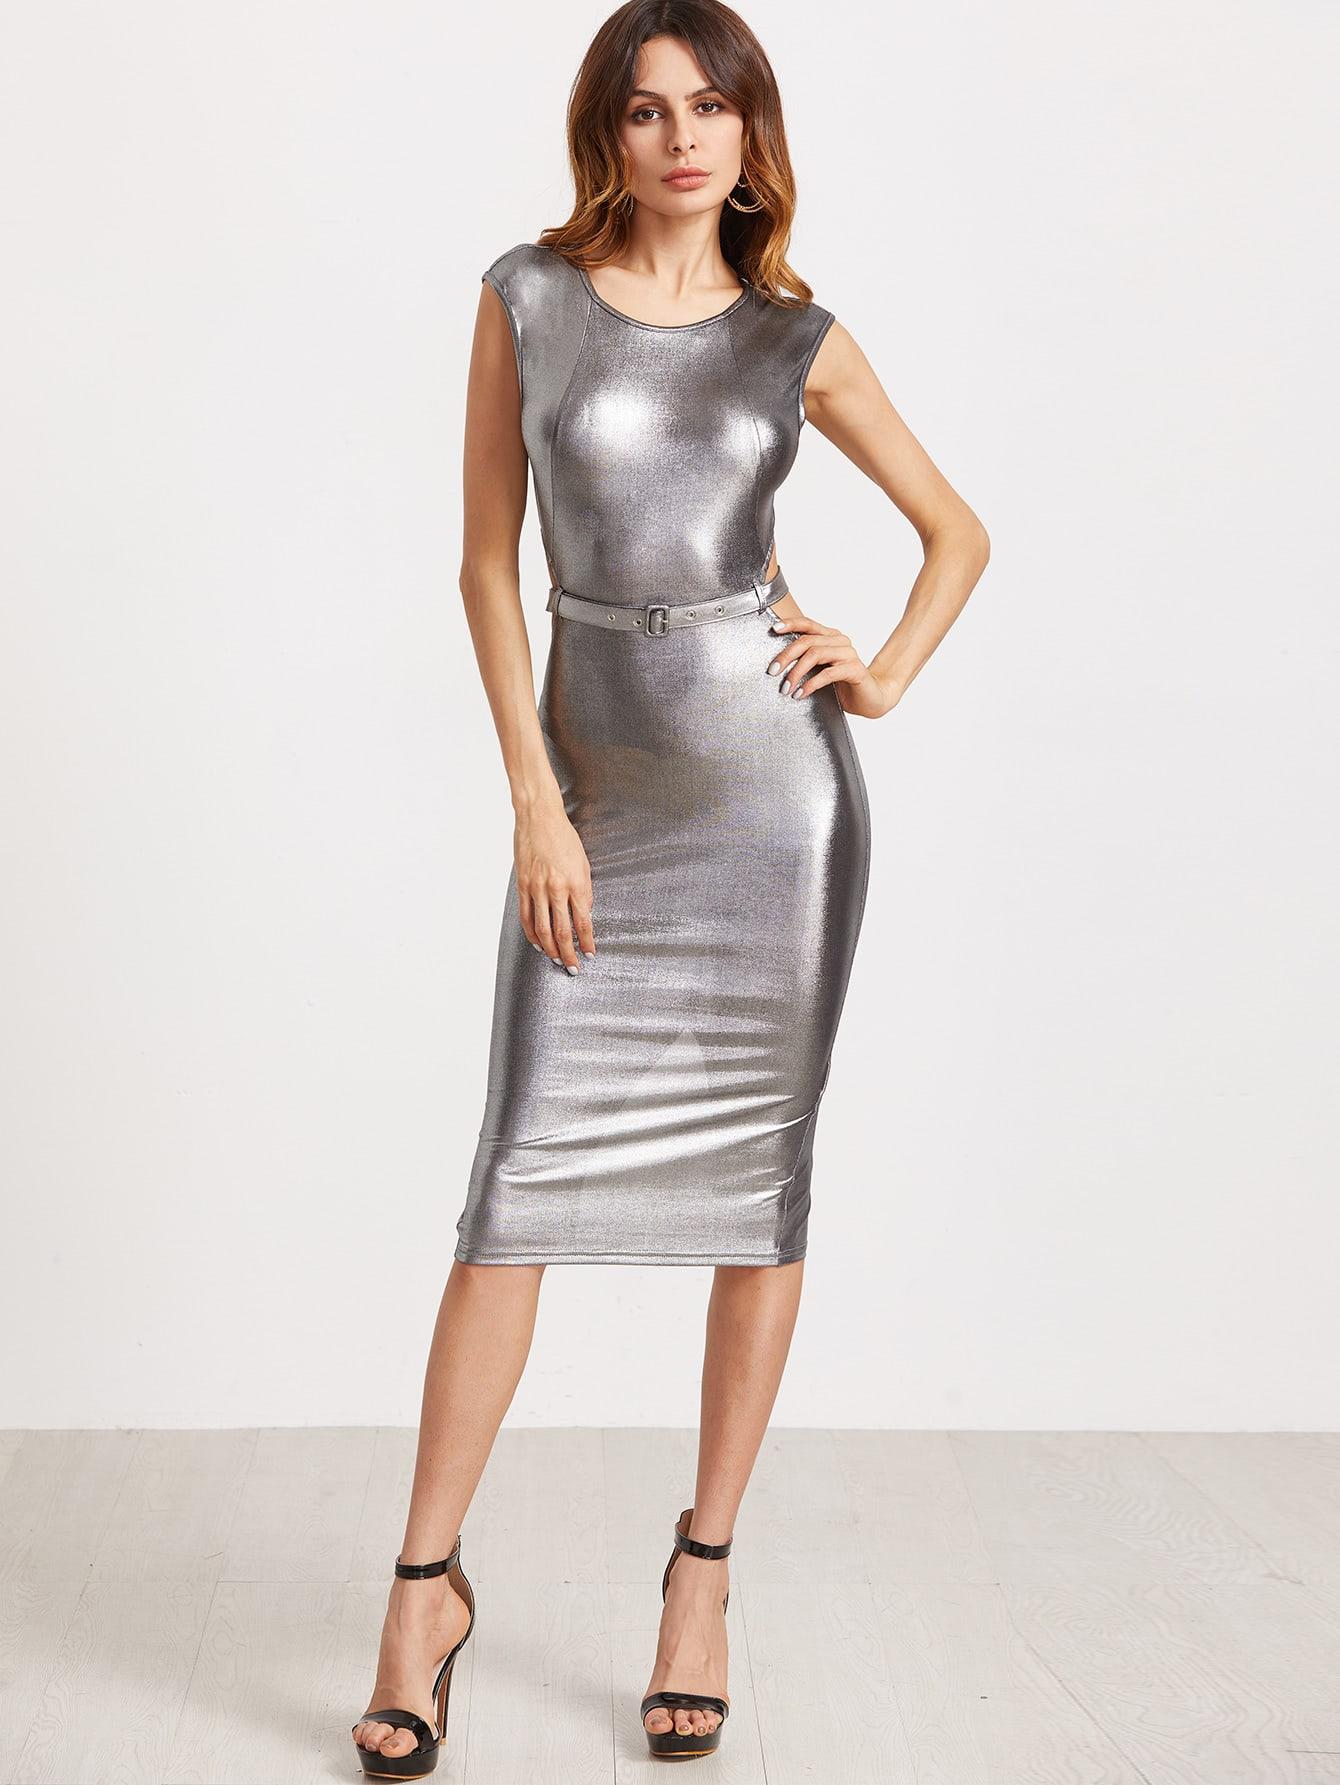 Фото Metallic Silver Belted Cutout Back Pencil Dress. Купить с доставкой